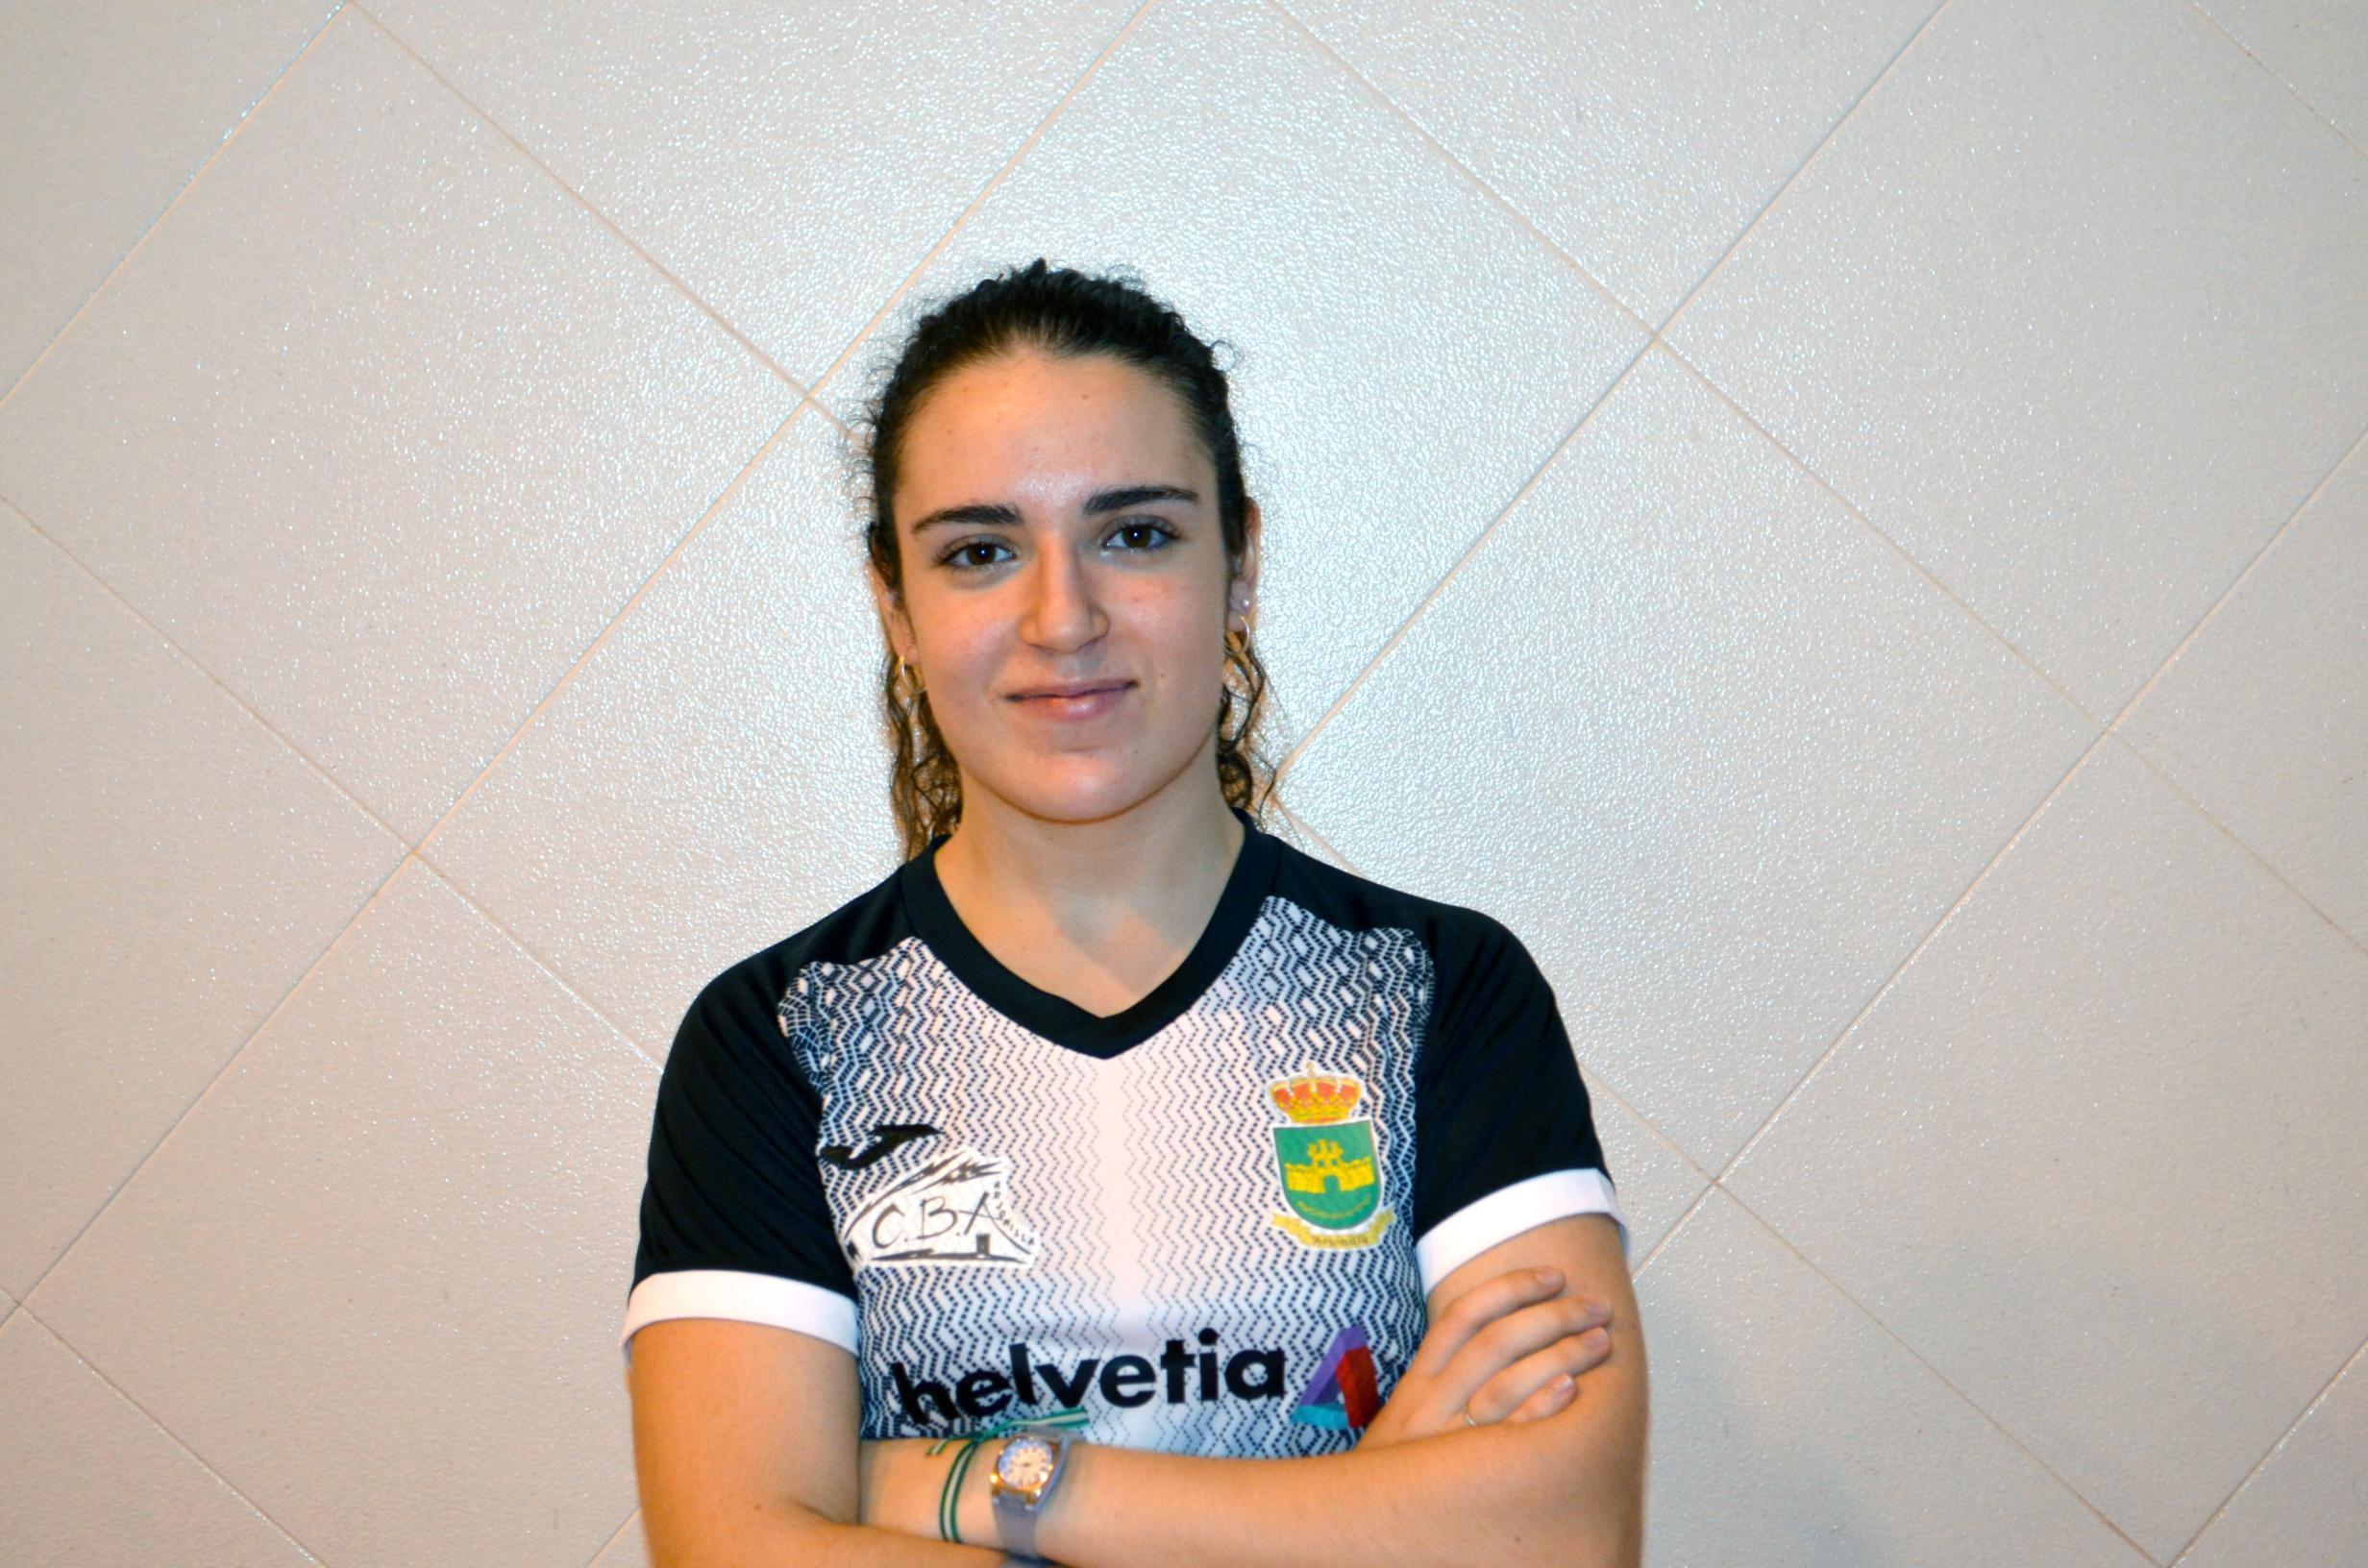 Carla Moyano